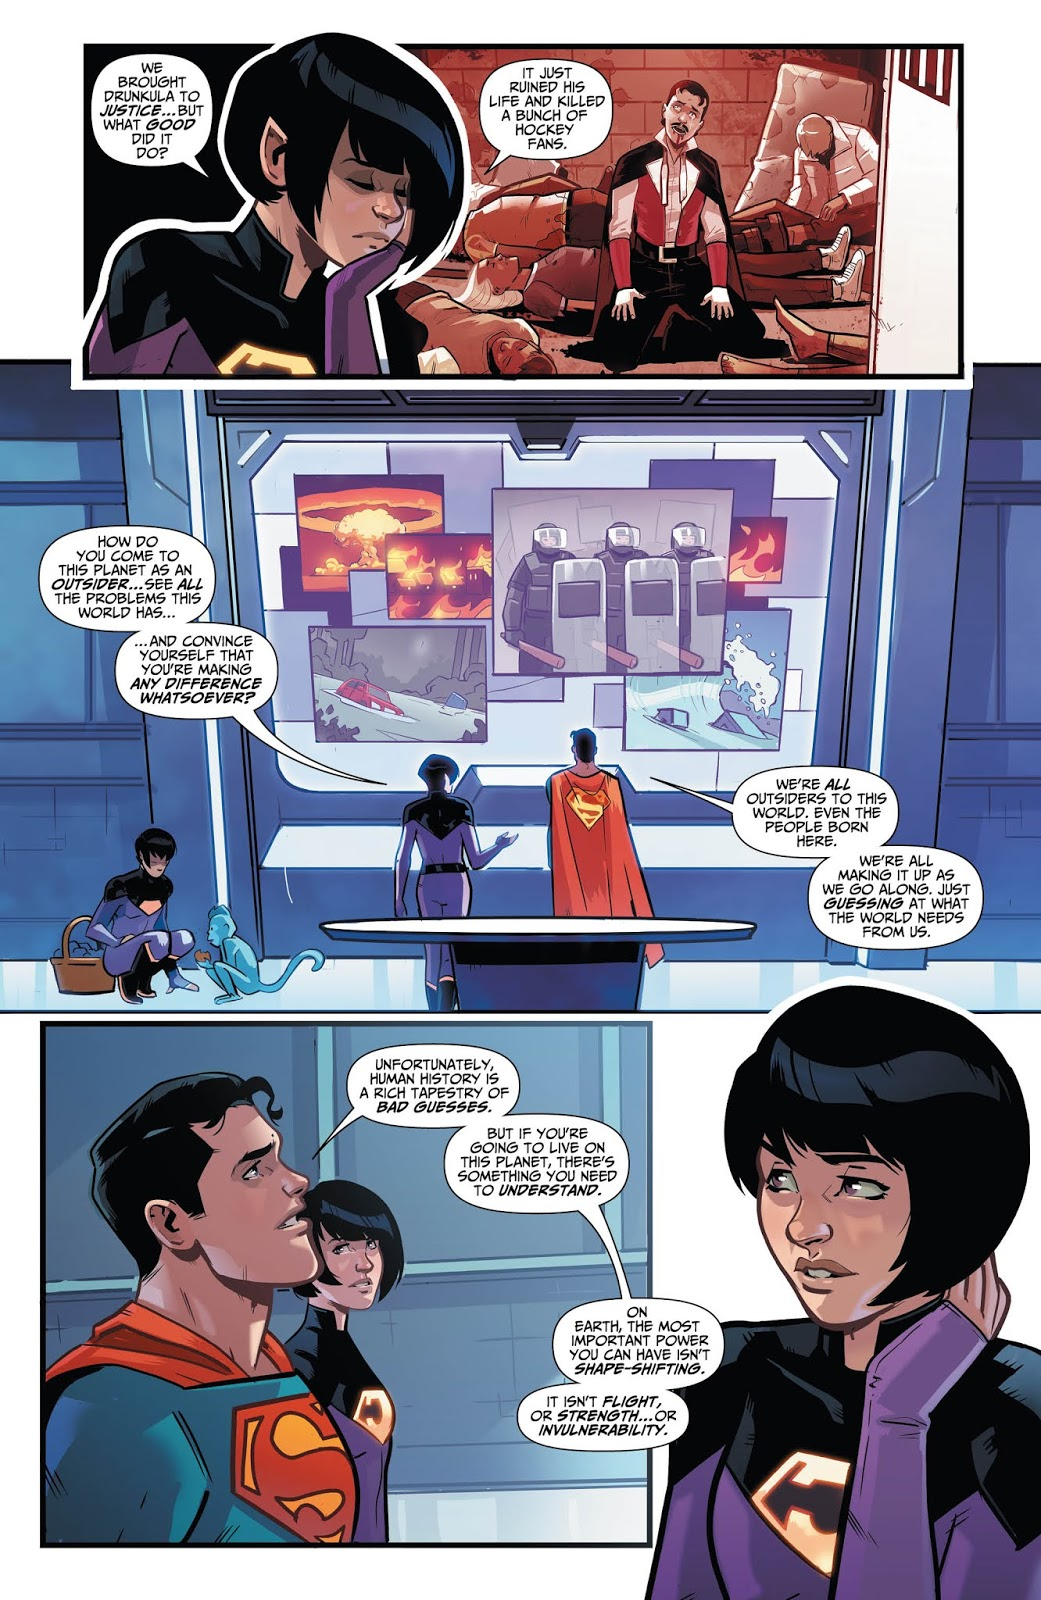 WONDER TWINS #3 Page 3.